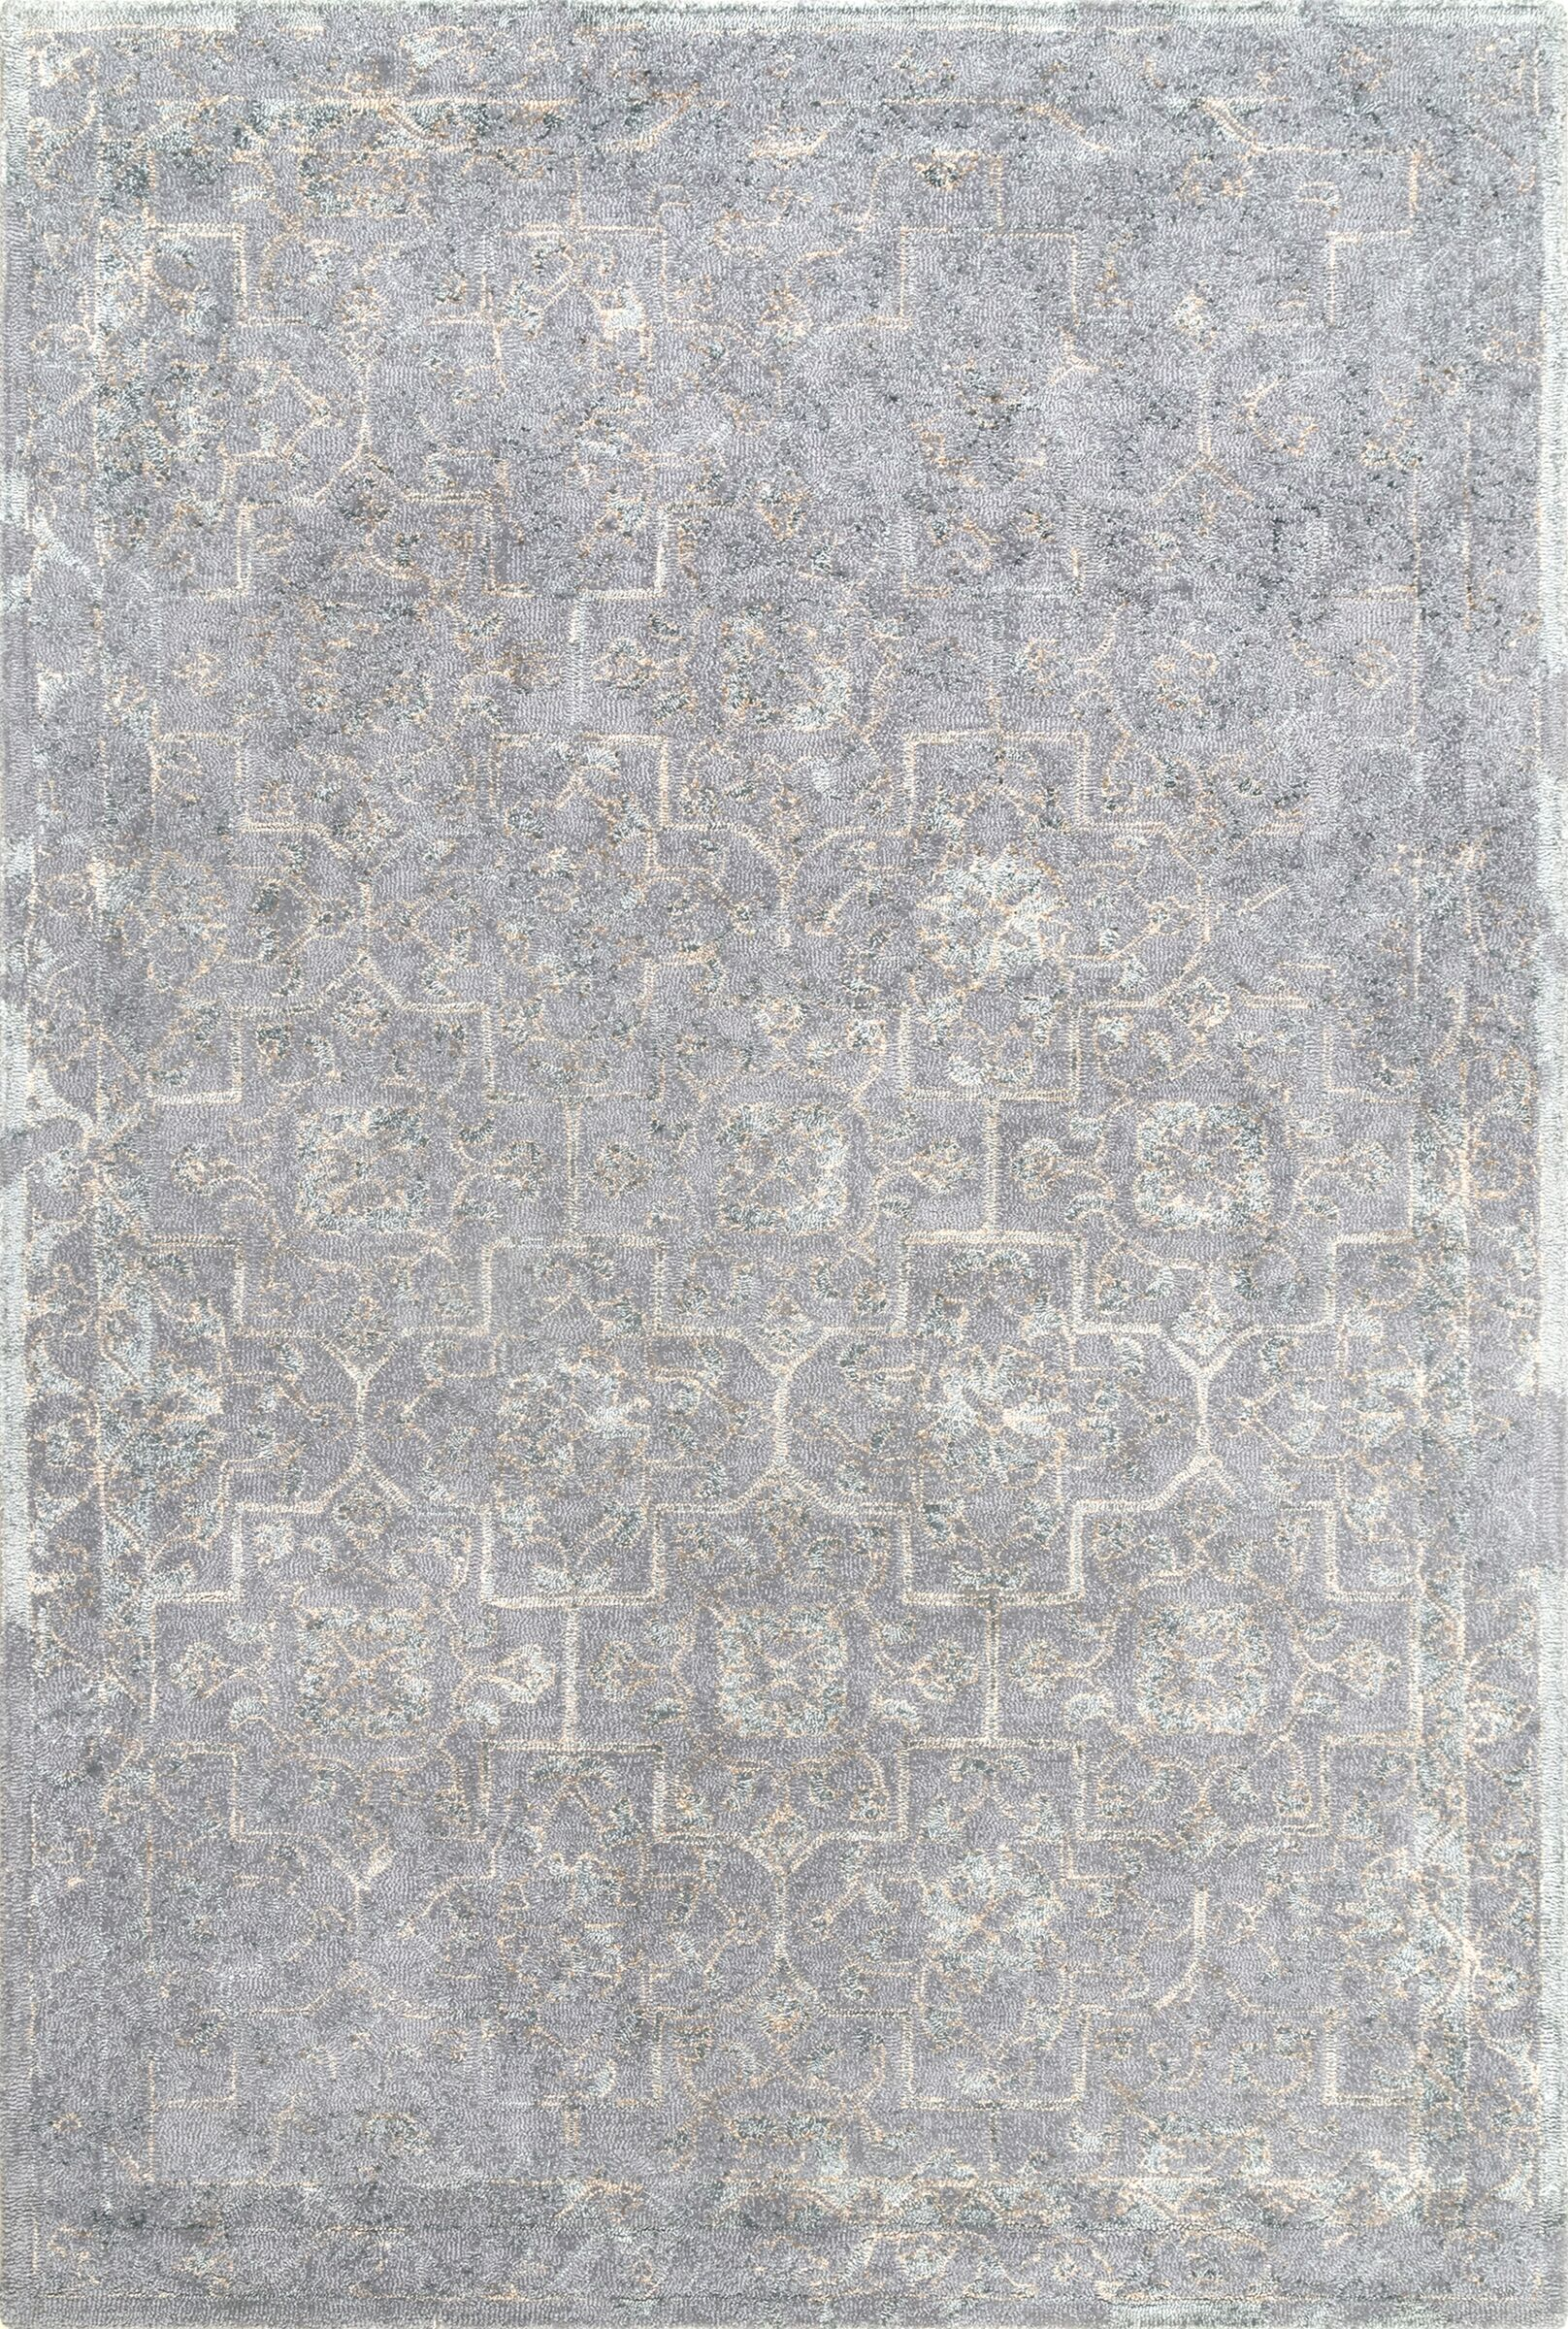 Aviana Hand-Tufted Gray Area Rug Rug Size: Rectangle 7' 6